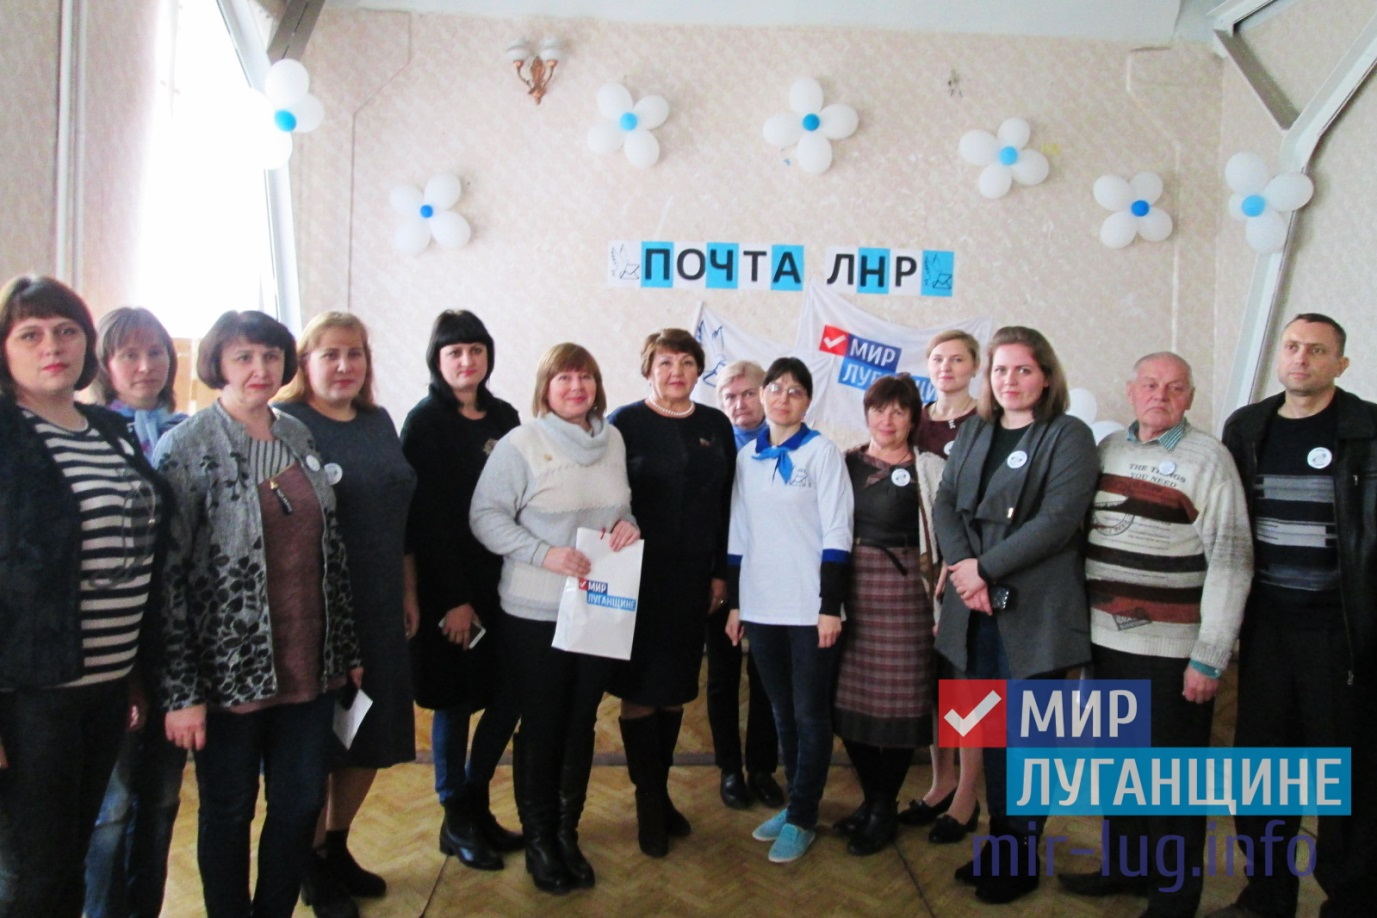 Депутат Народного совета ЛНР Елена Рахмукова встретилась с жителями Антрацита 1